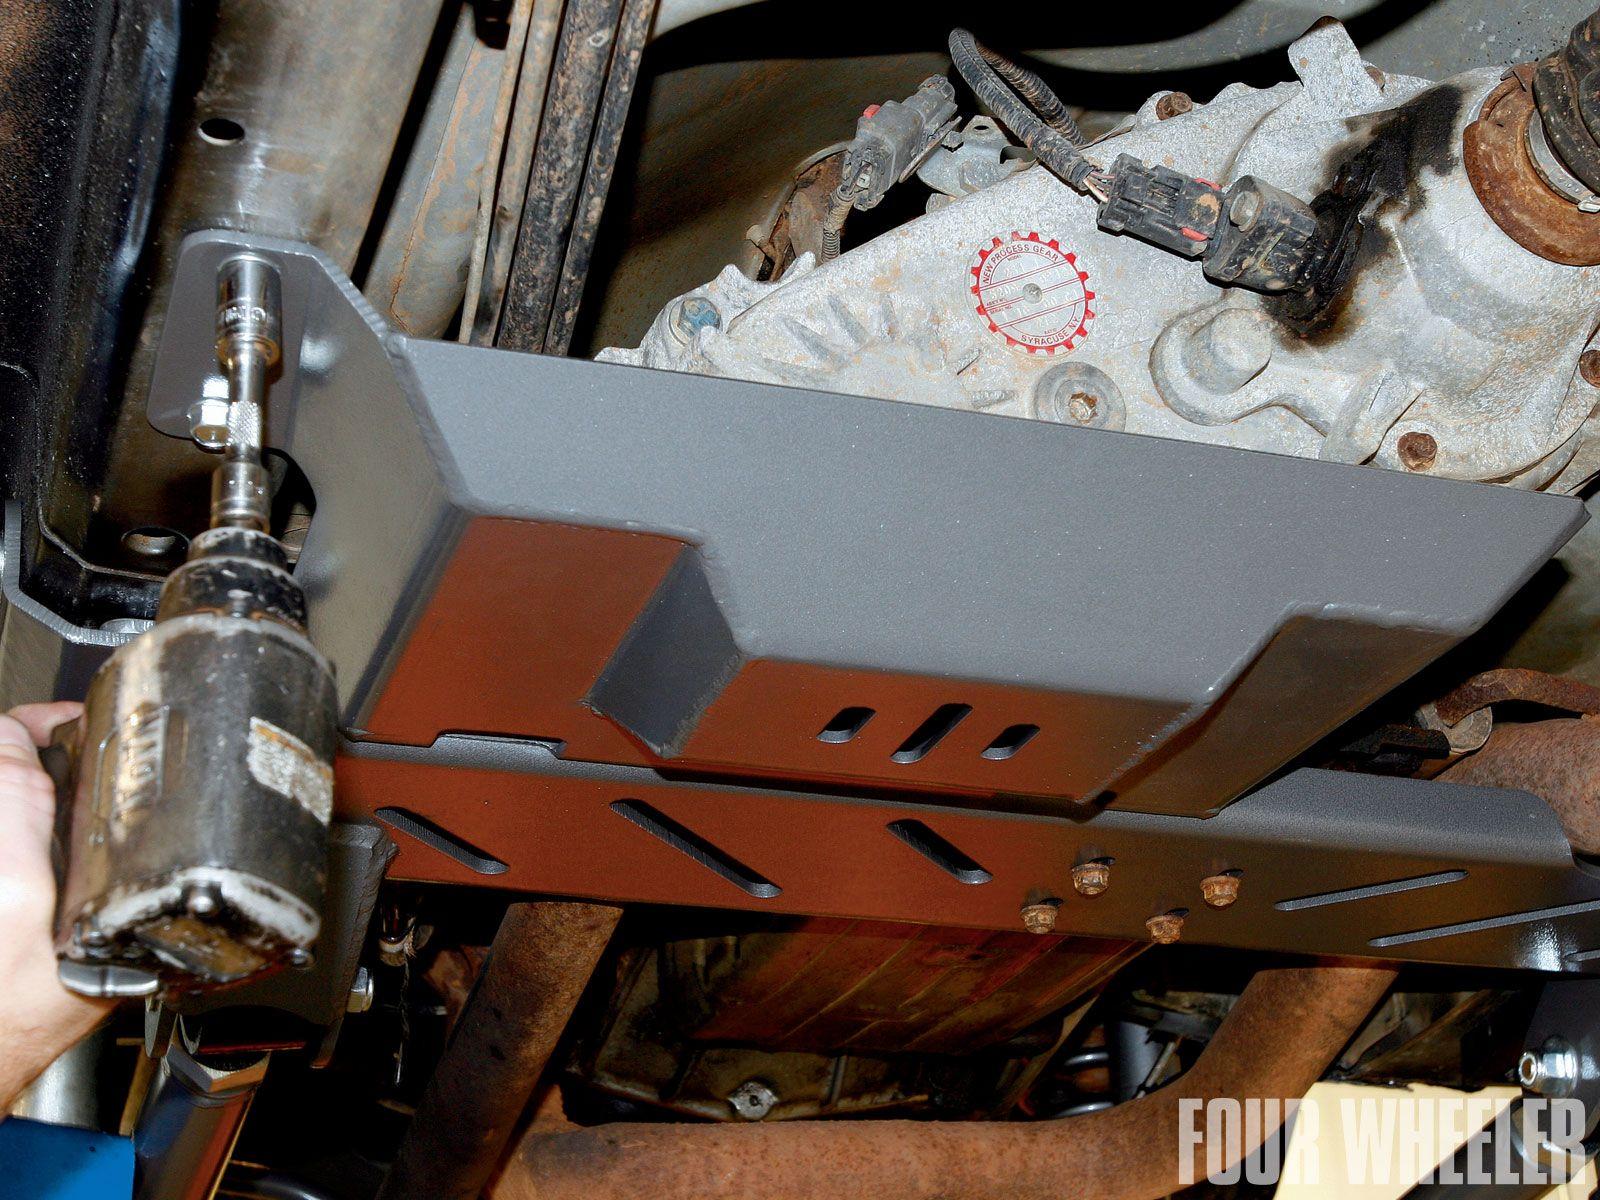 Jeep Cherokee Xj Rough Country Long Arm Suspension Skid Plates Jeep Cherokee Jeep Cherokee Xj Jeep Xj